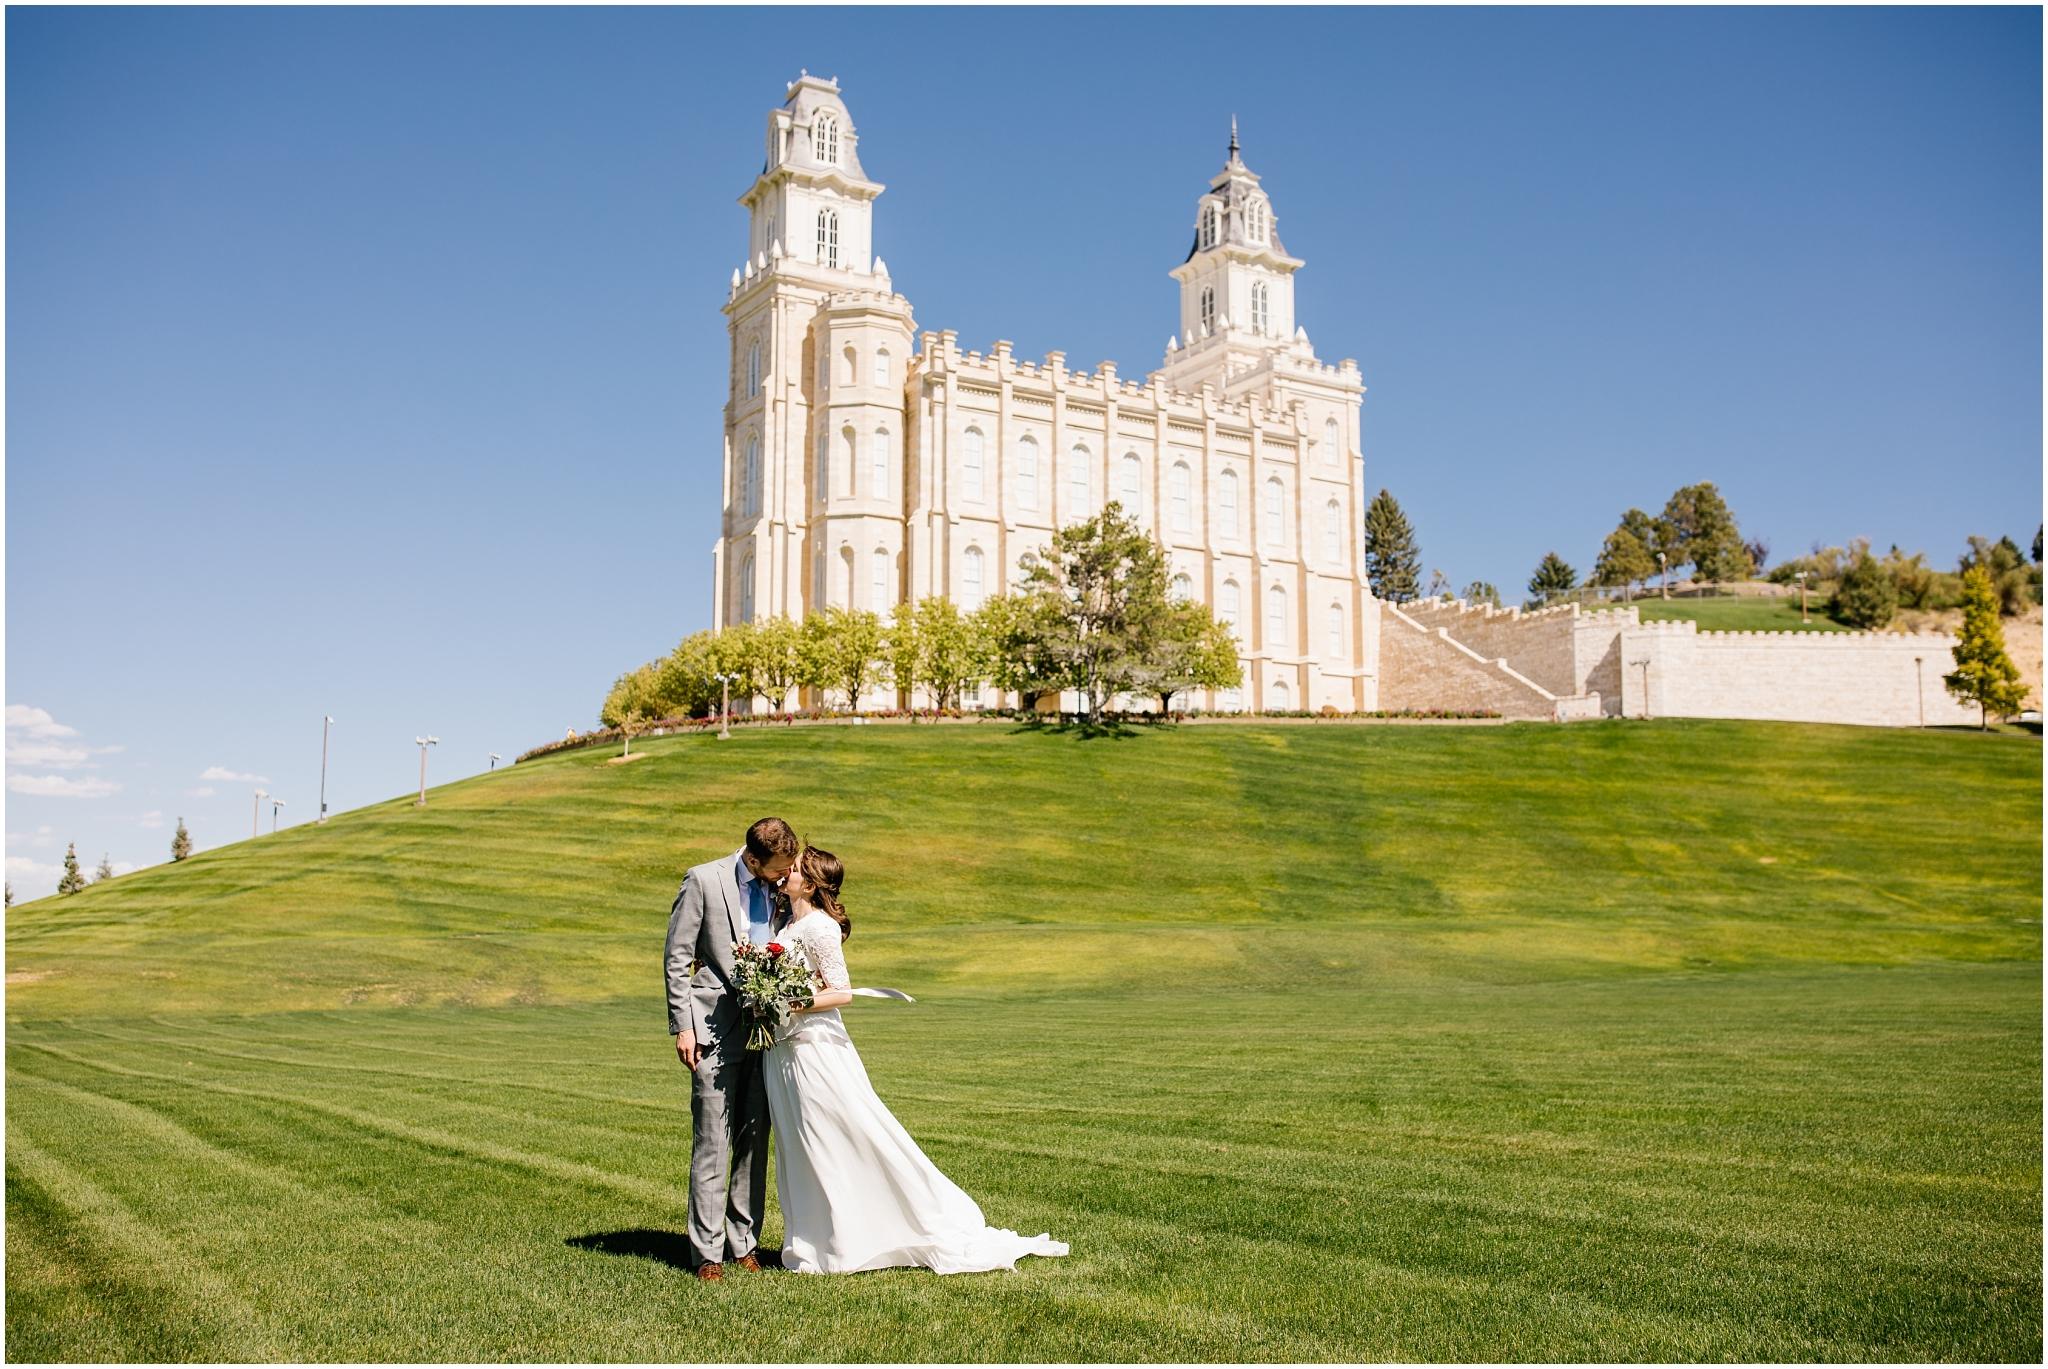 BrynneWinston-79_Lizzie-B-Imagery-Utah-Wedding-Photographer-Utah-County-Manti-Temple.jpg